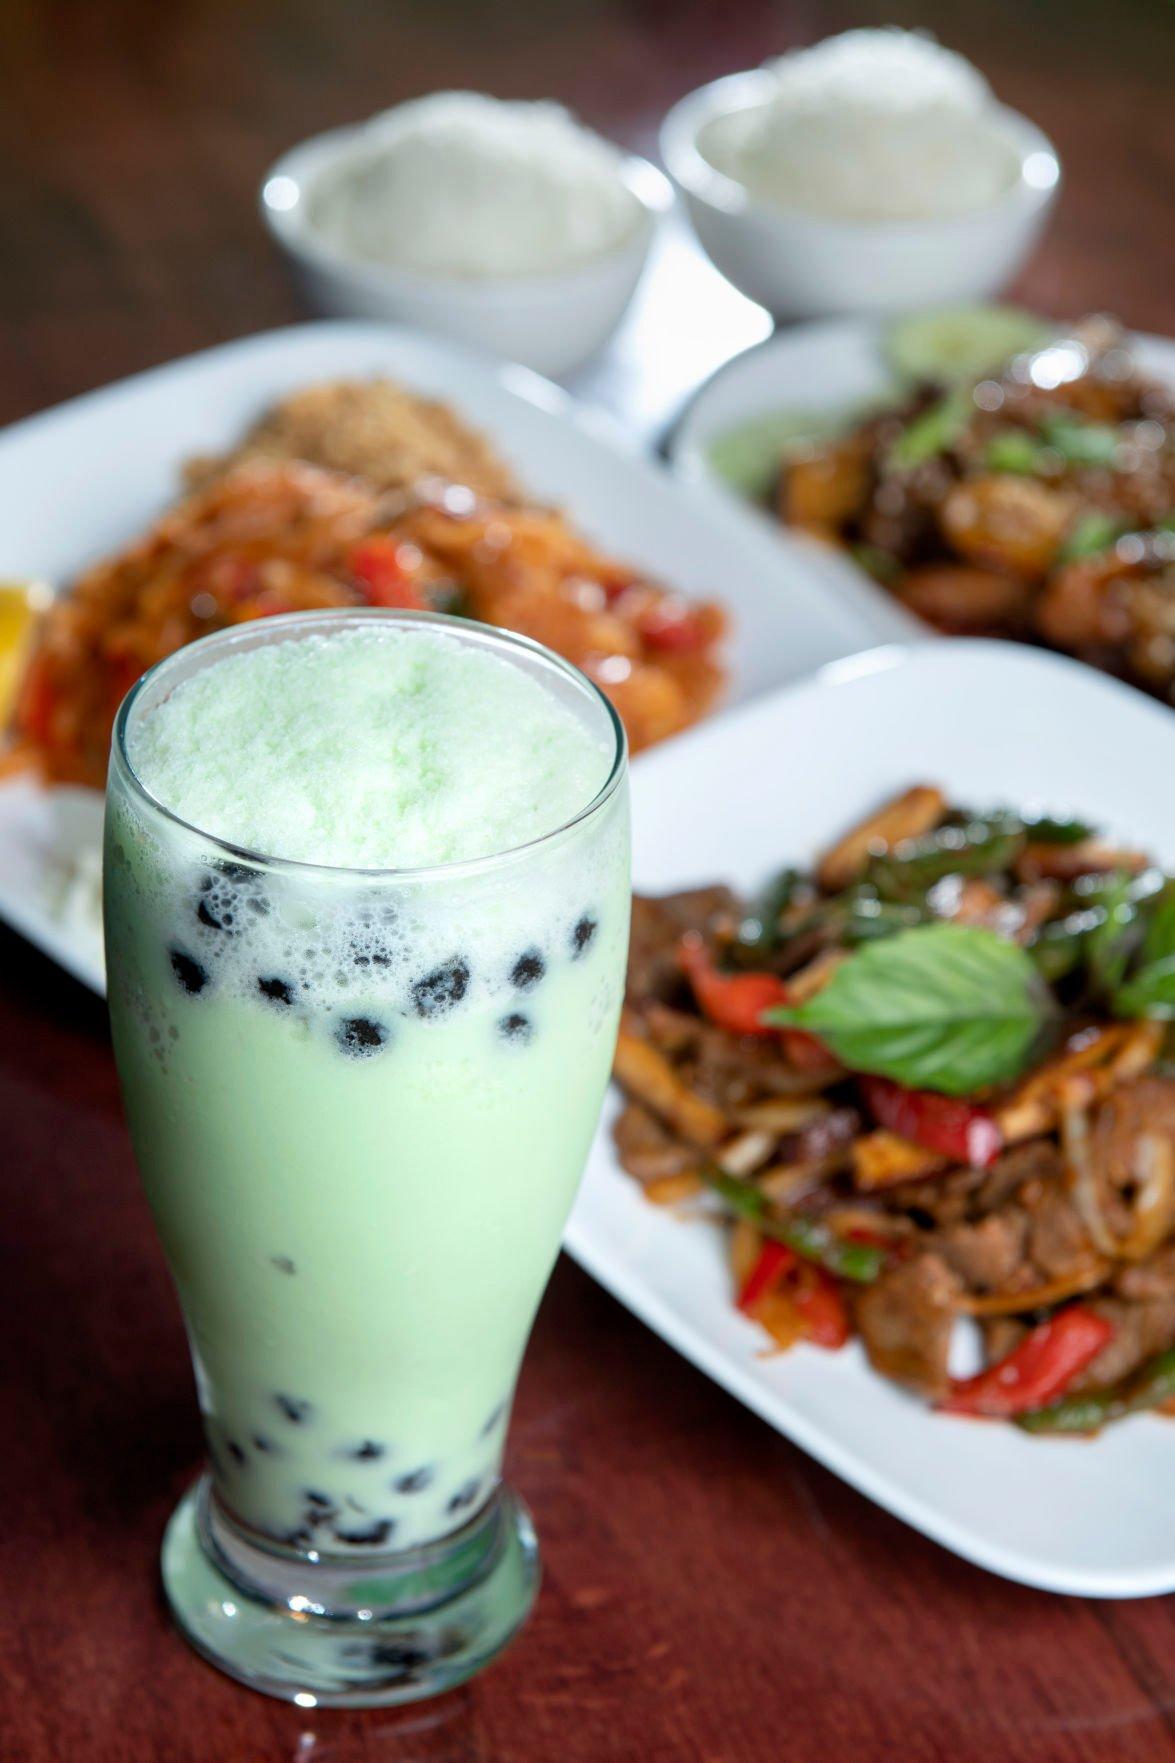 High Peak Asian Restaurant, 10.6